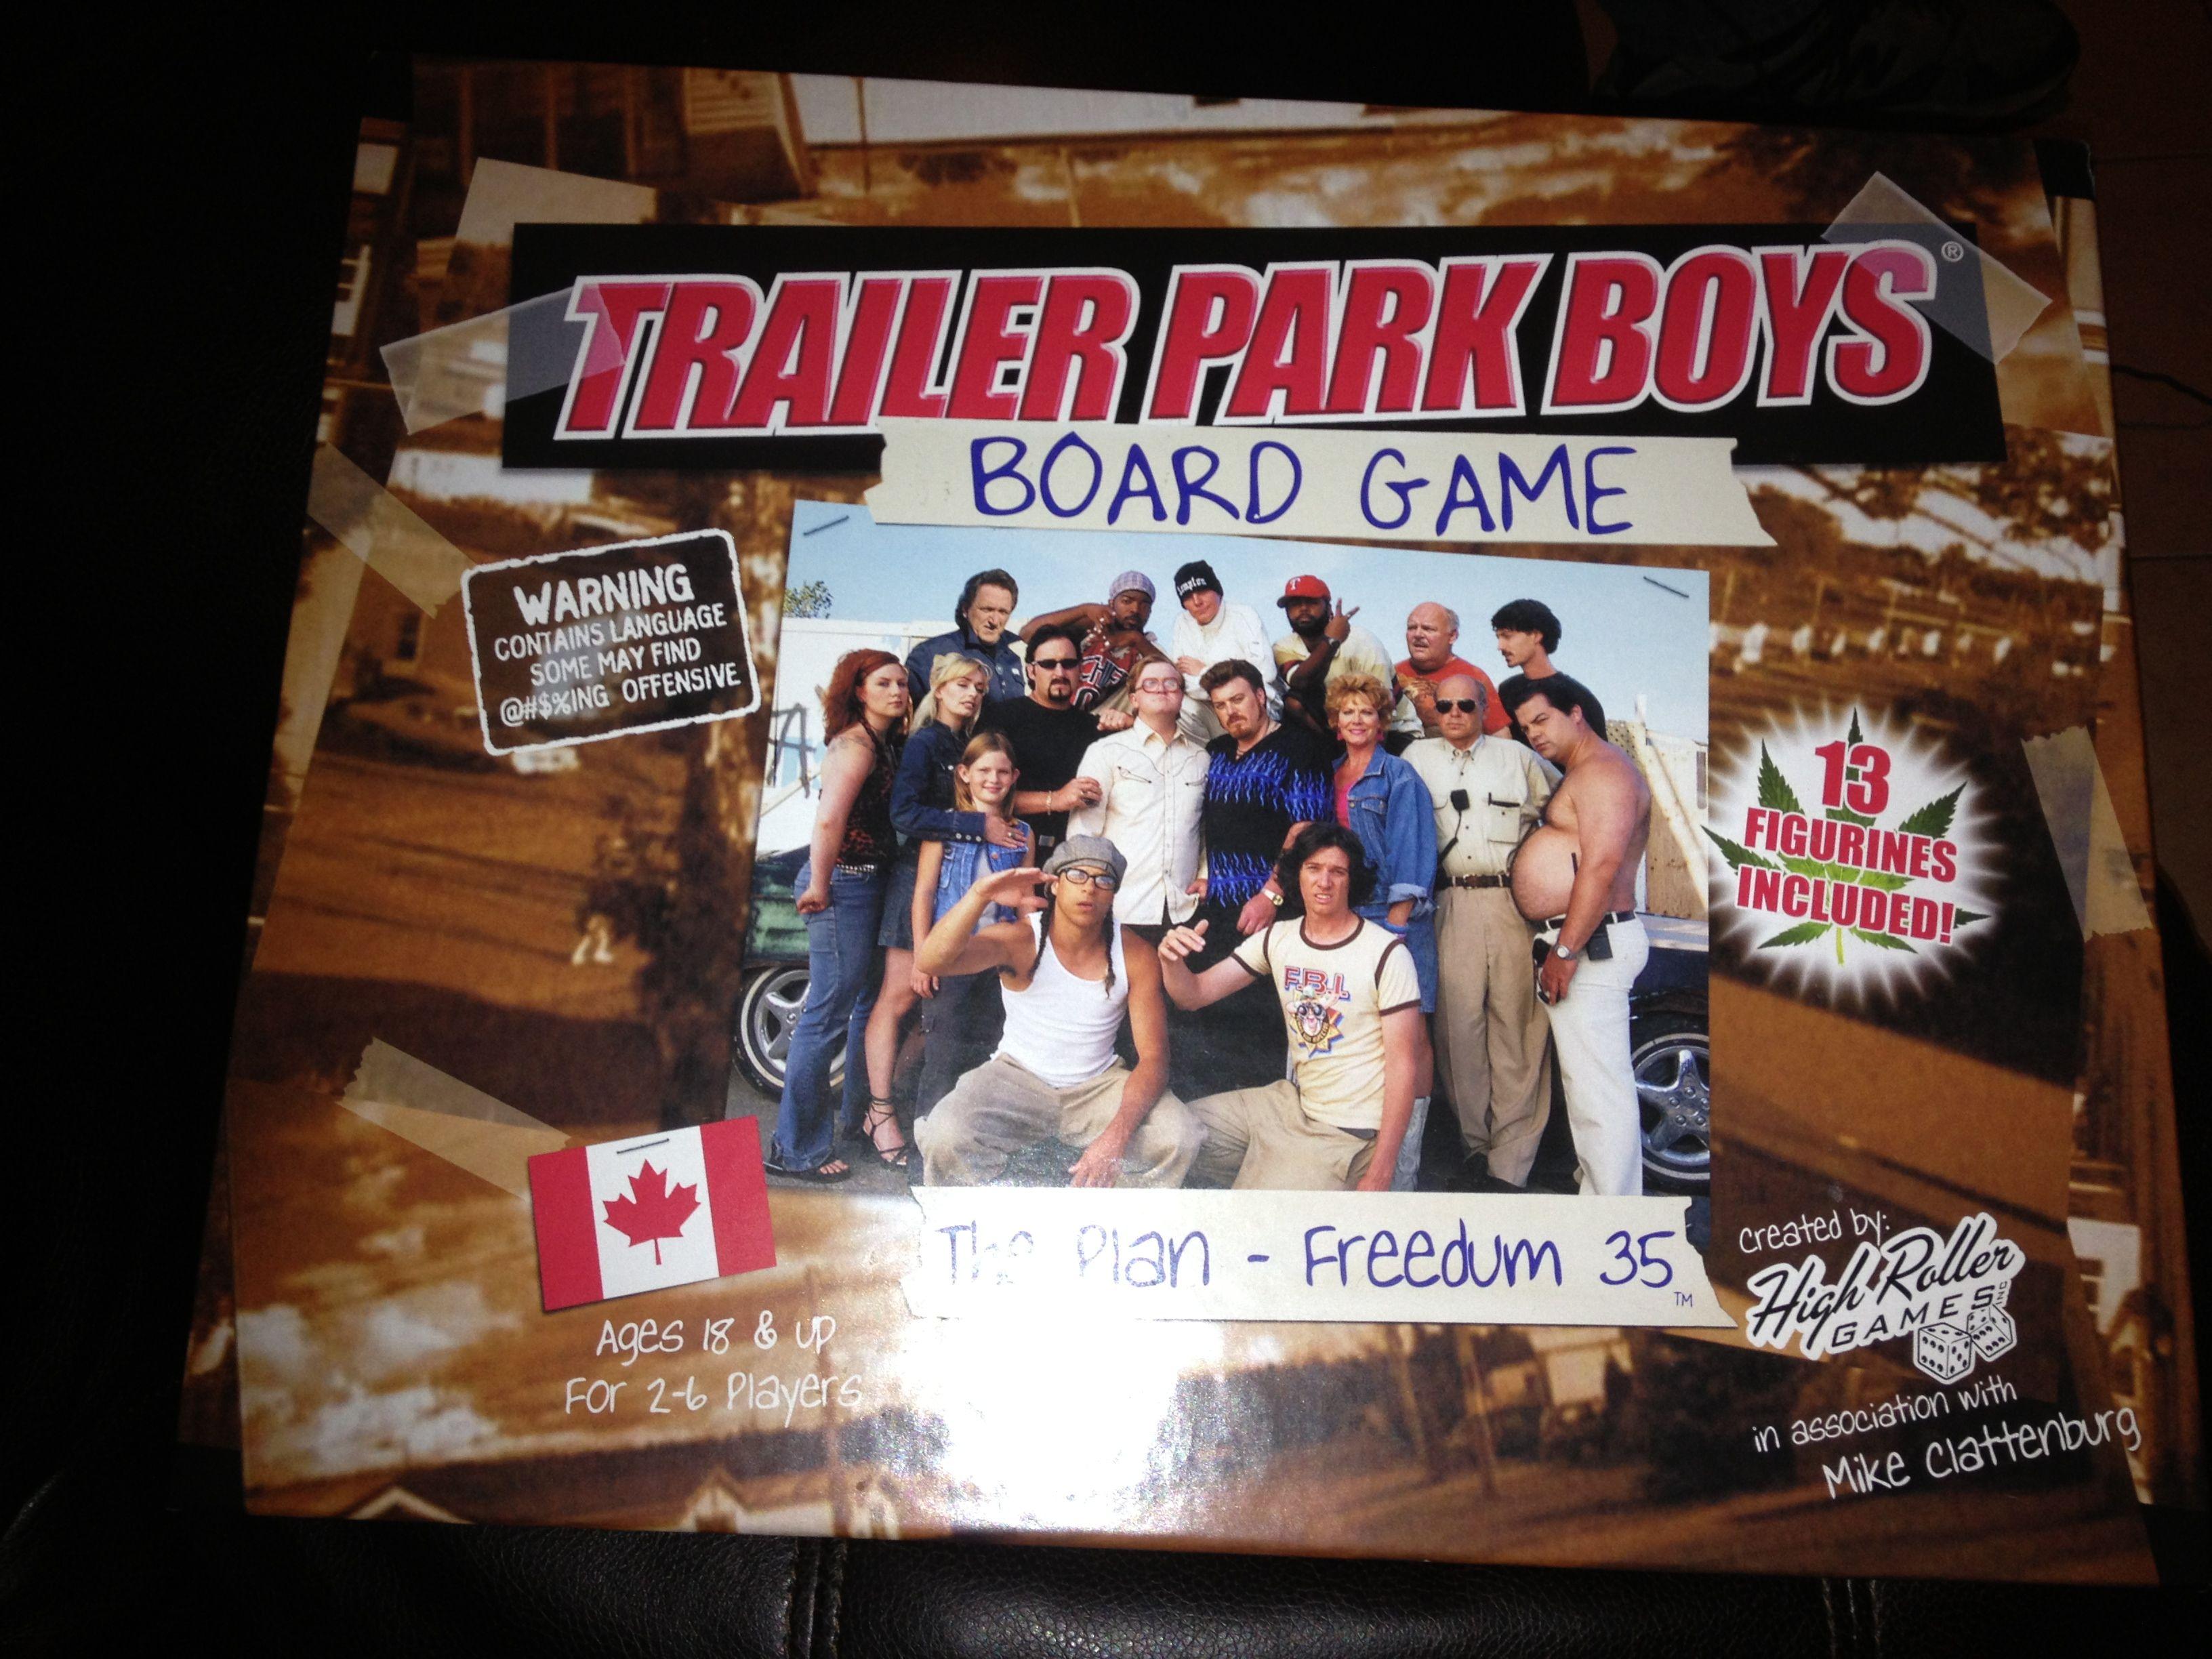 Trailer park boys board game Trailer park boys Pinterest